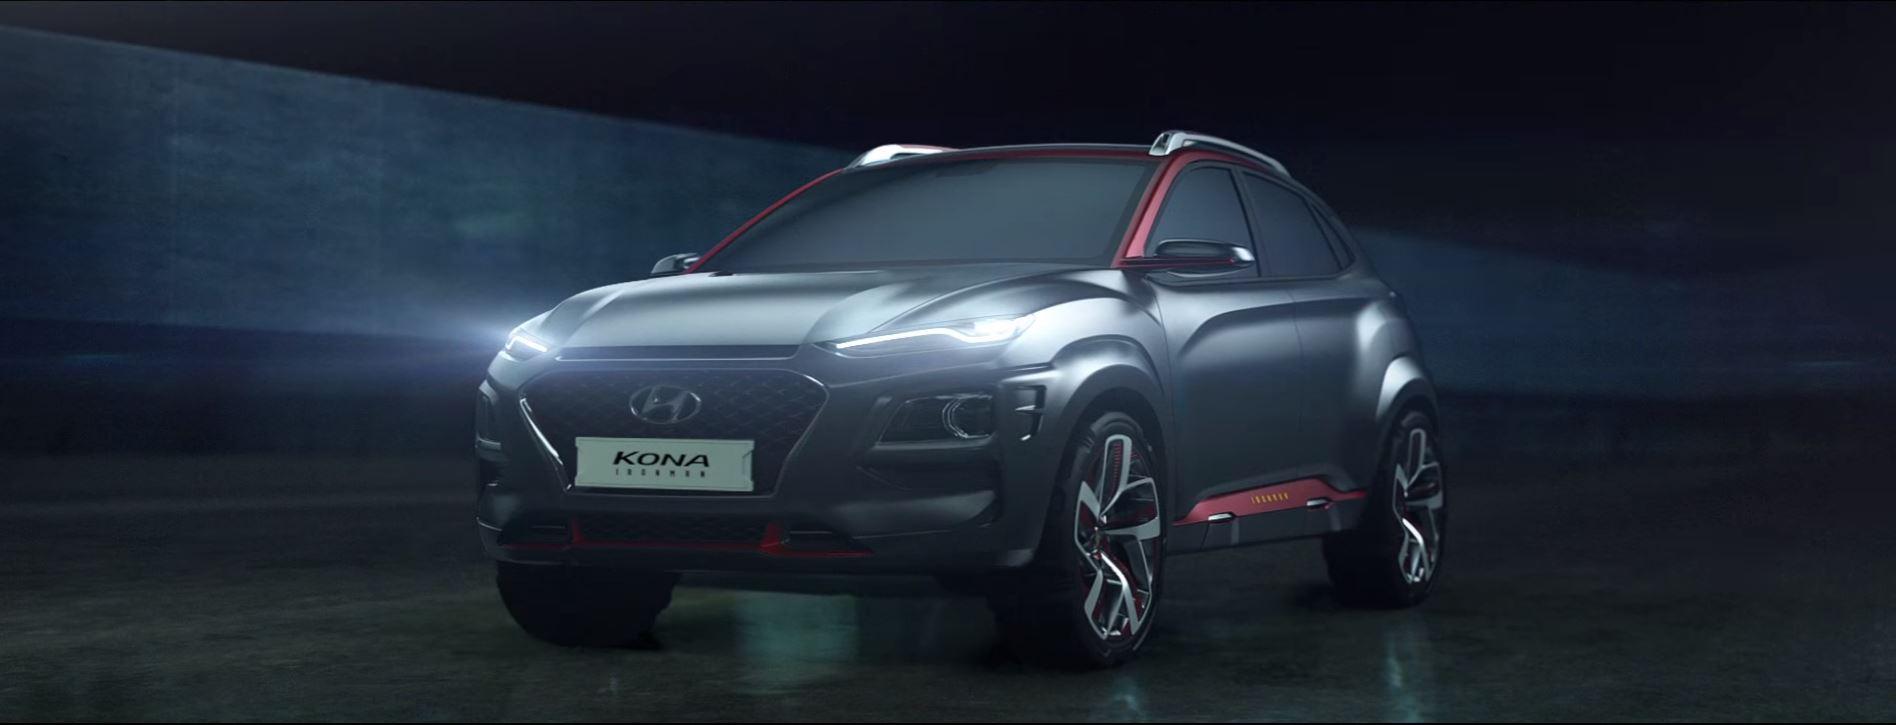 Hyundai Combines Marvel's Iron Man with New Kona Crossover ...